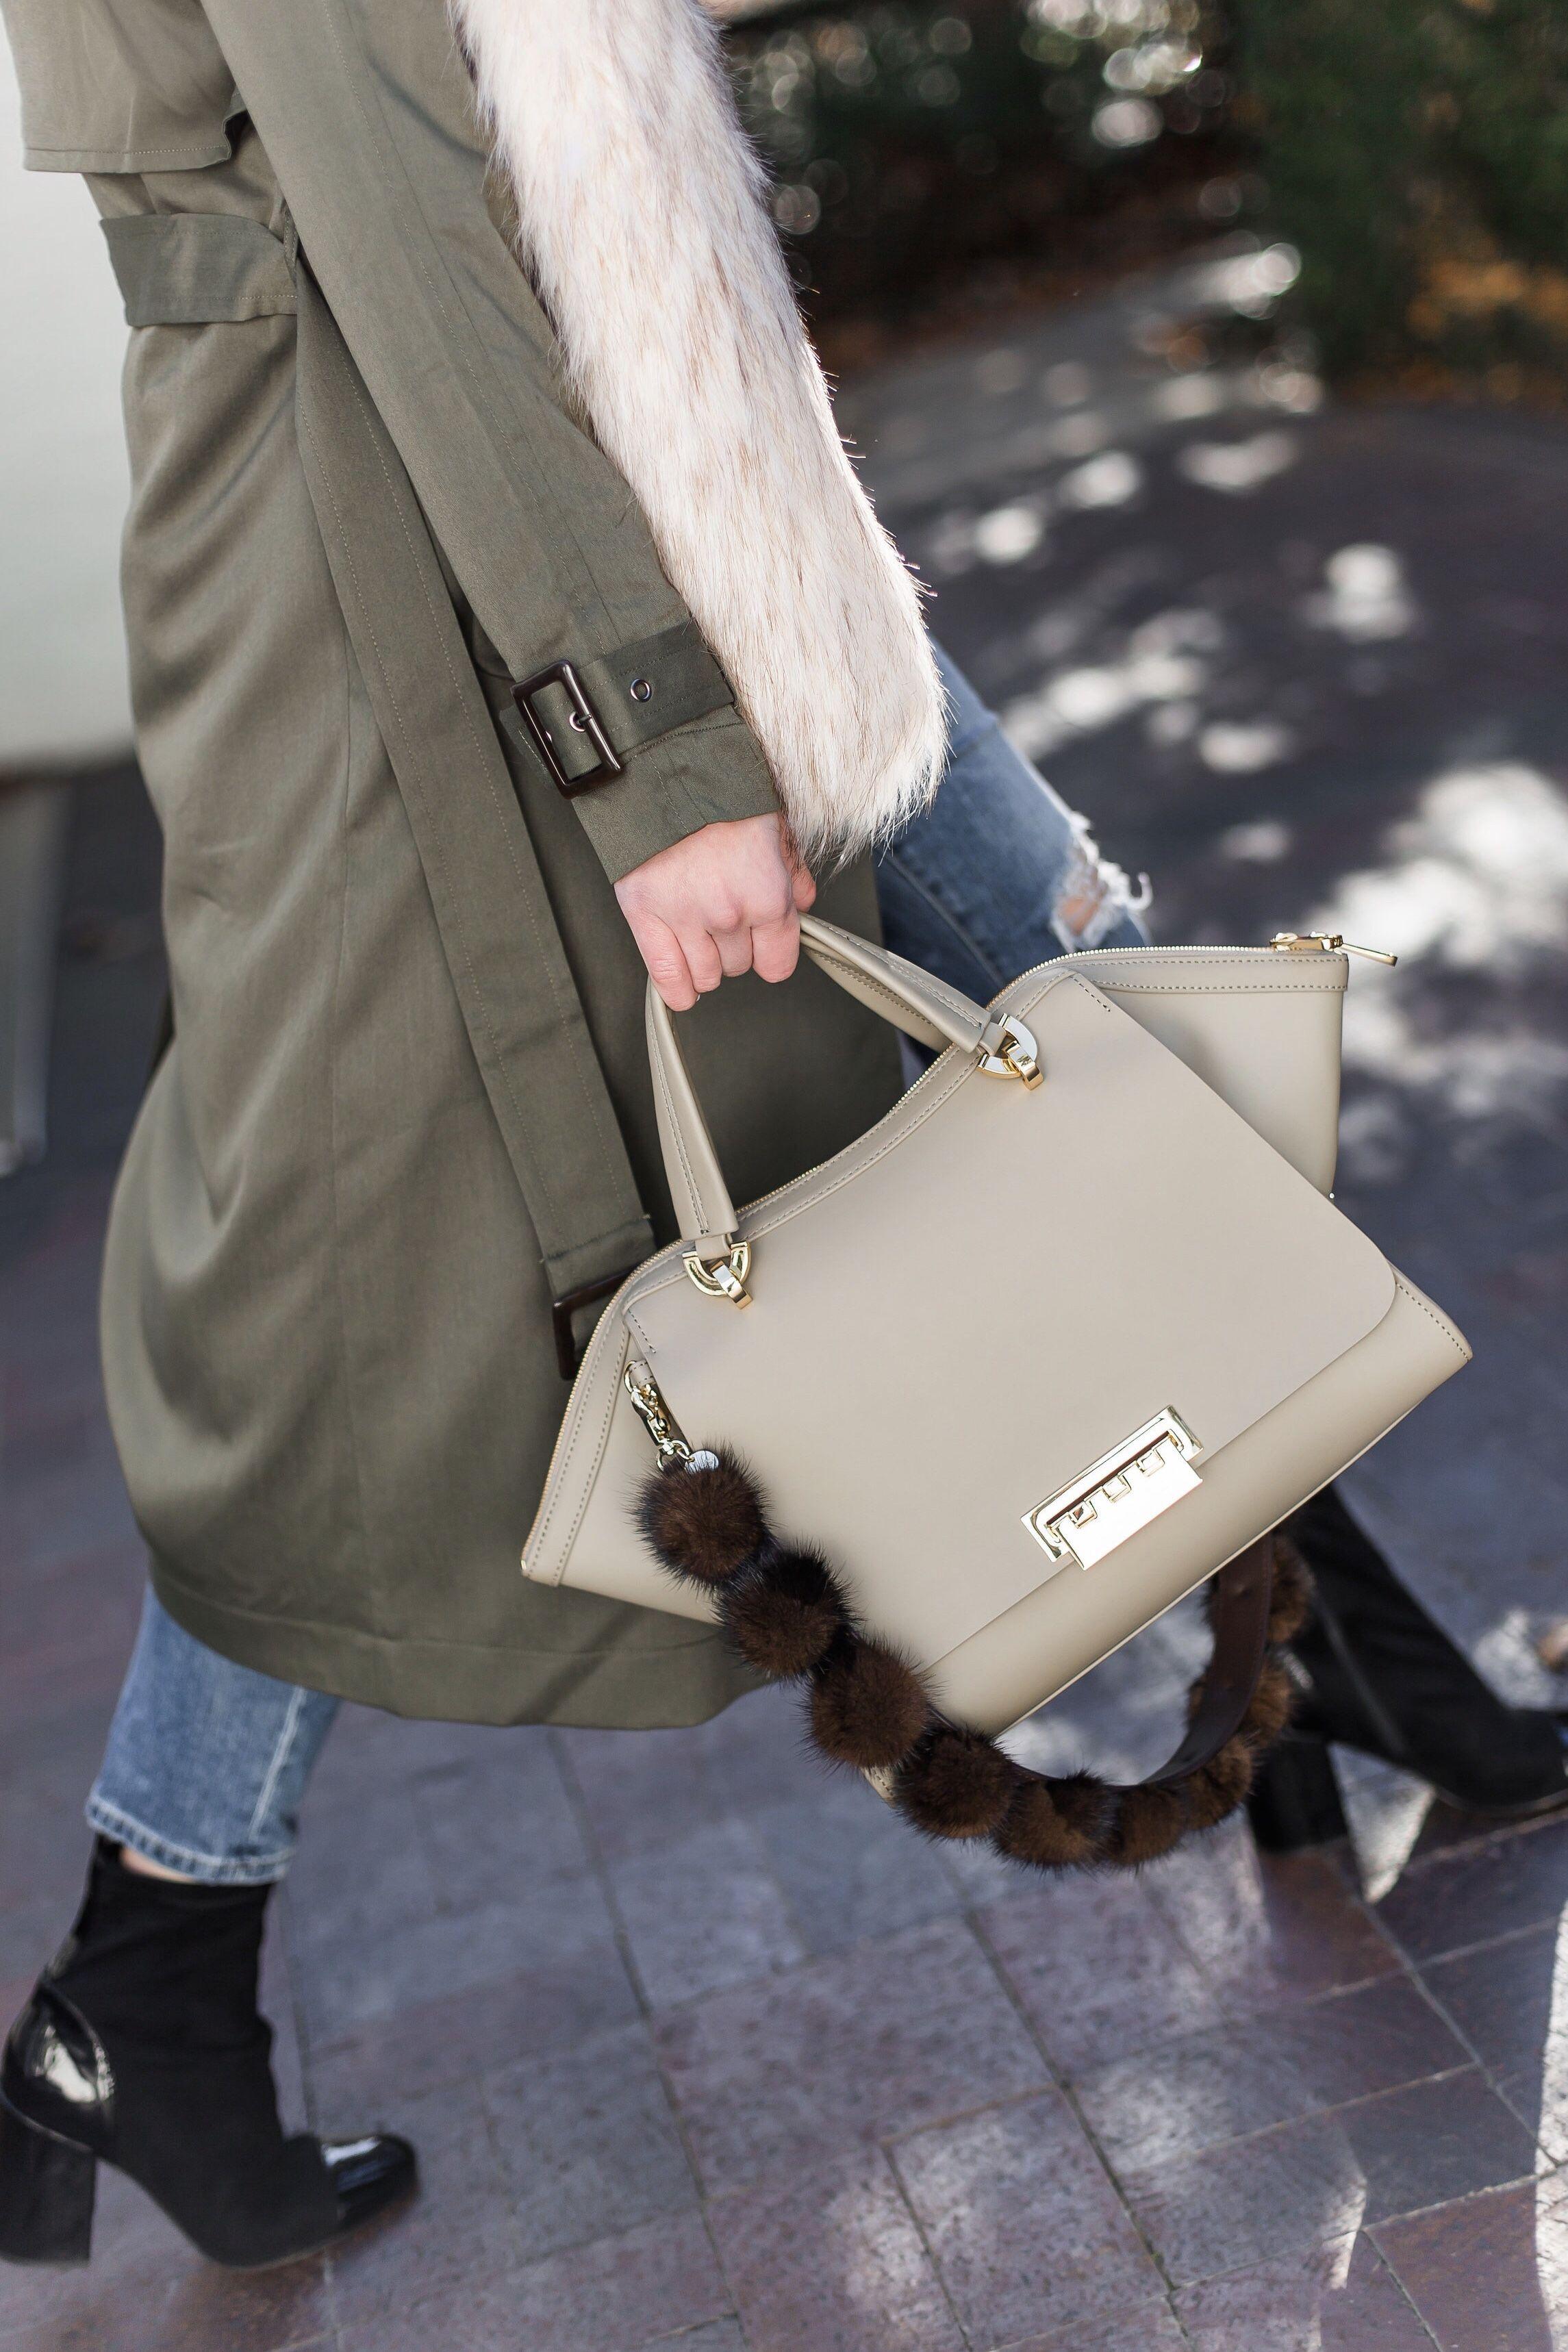 87490c01067 Dallas fashion blogger carrying Zac Posen neutral satchel